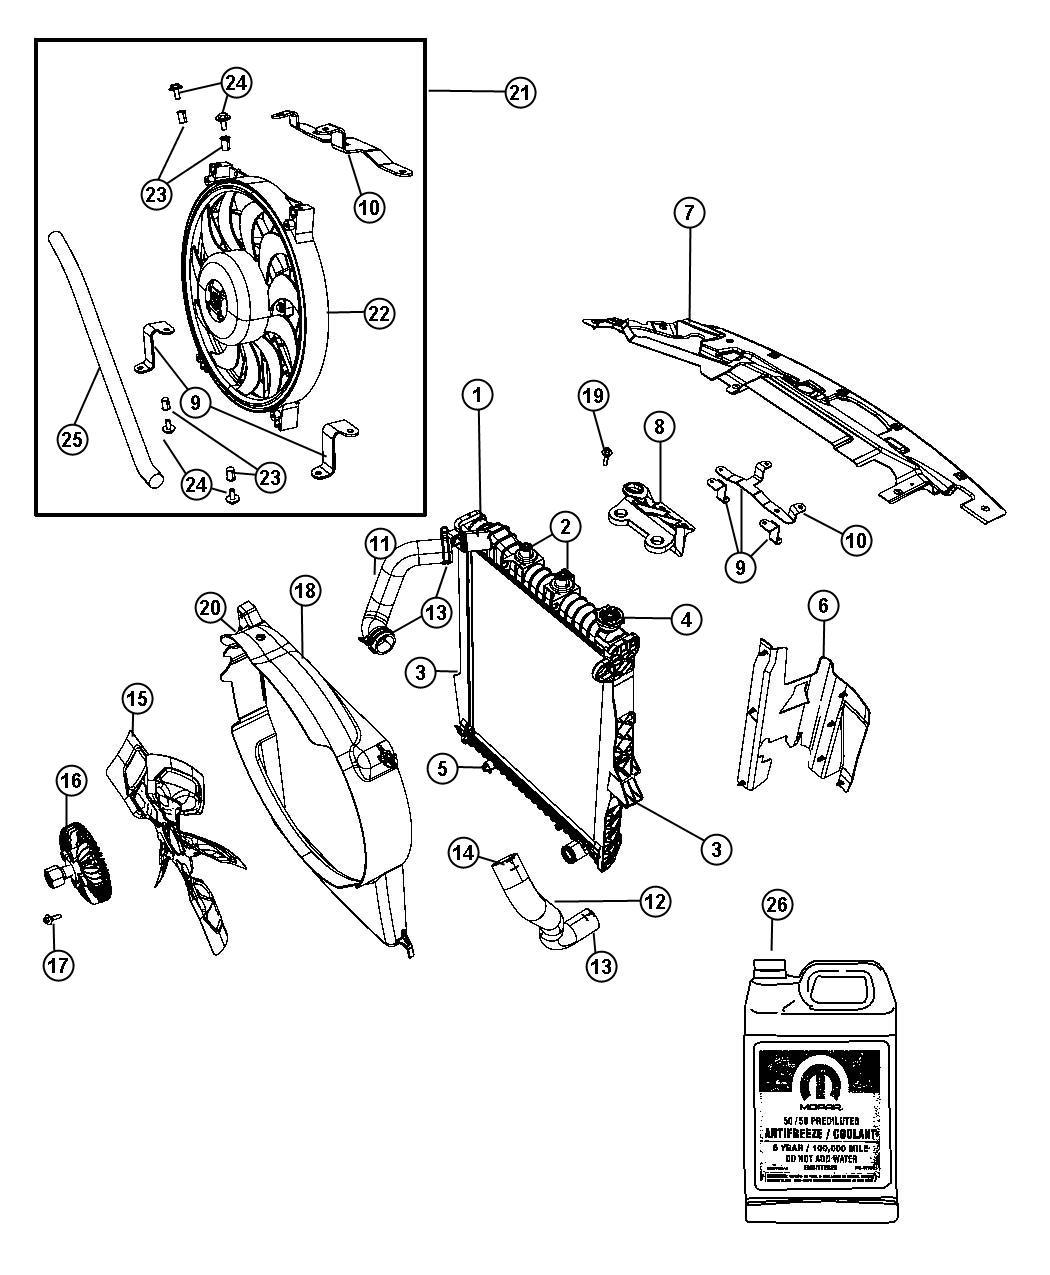 Dodge Durango Fan module package. Radiator cooling